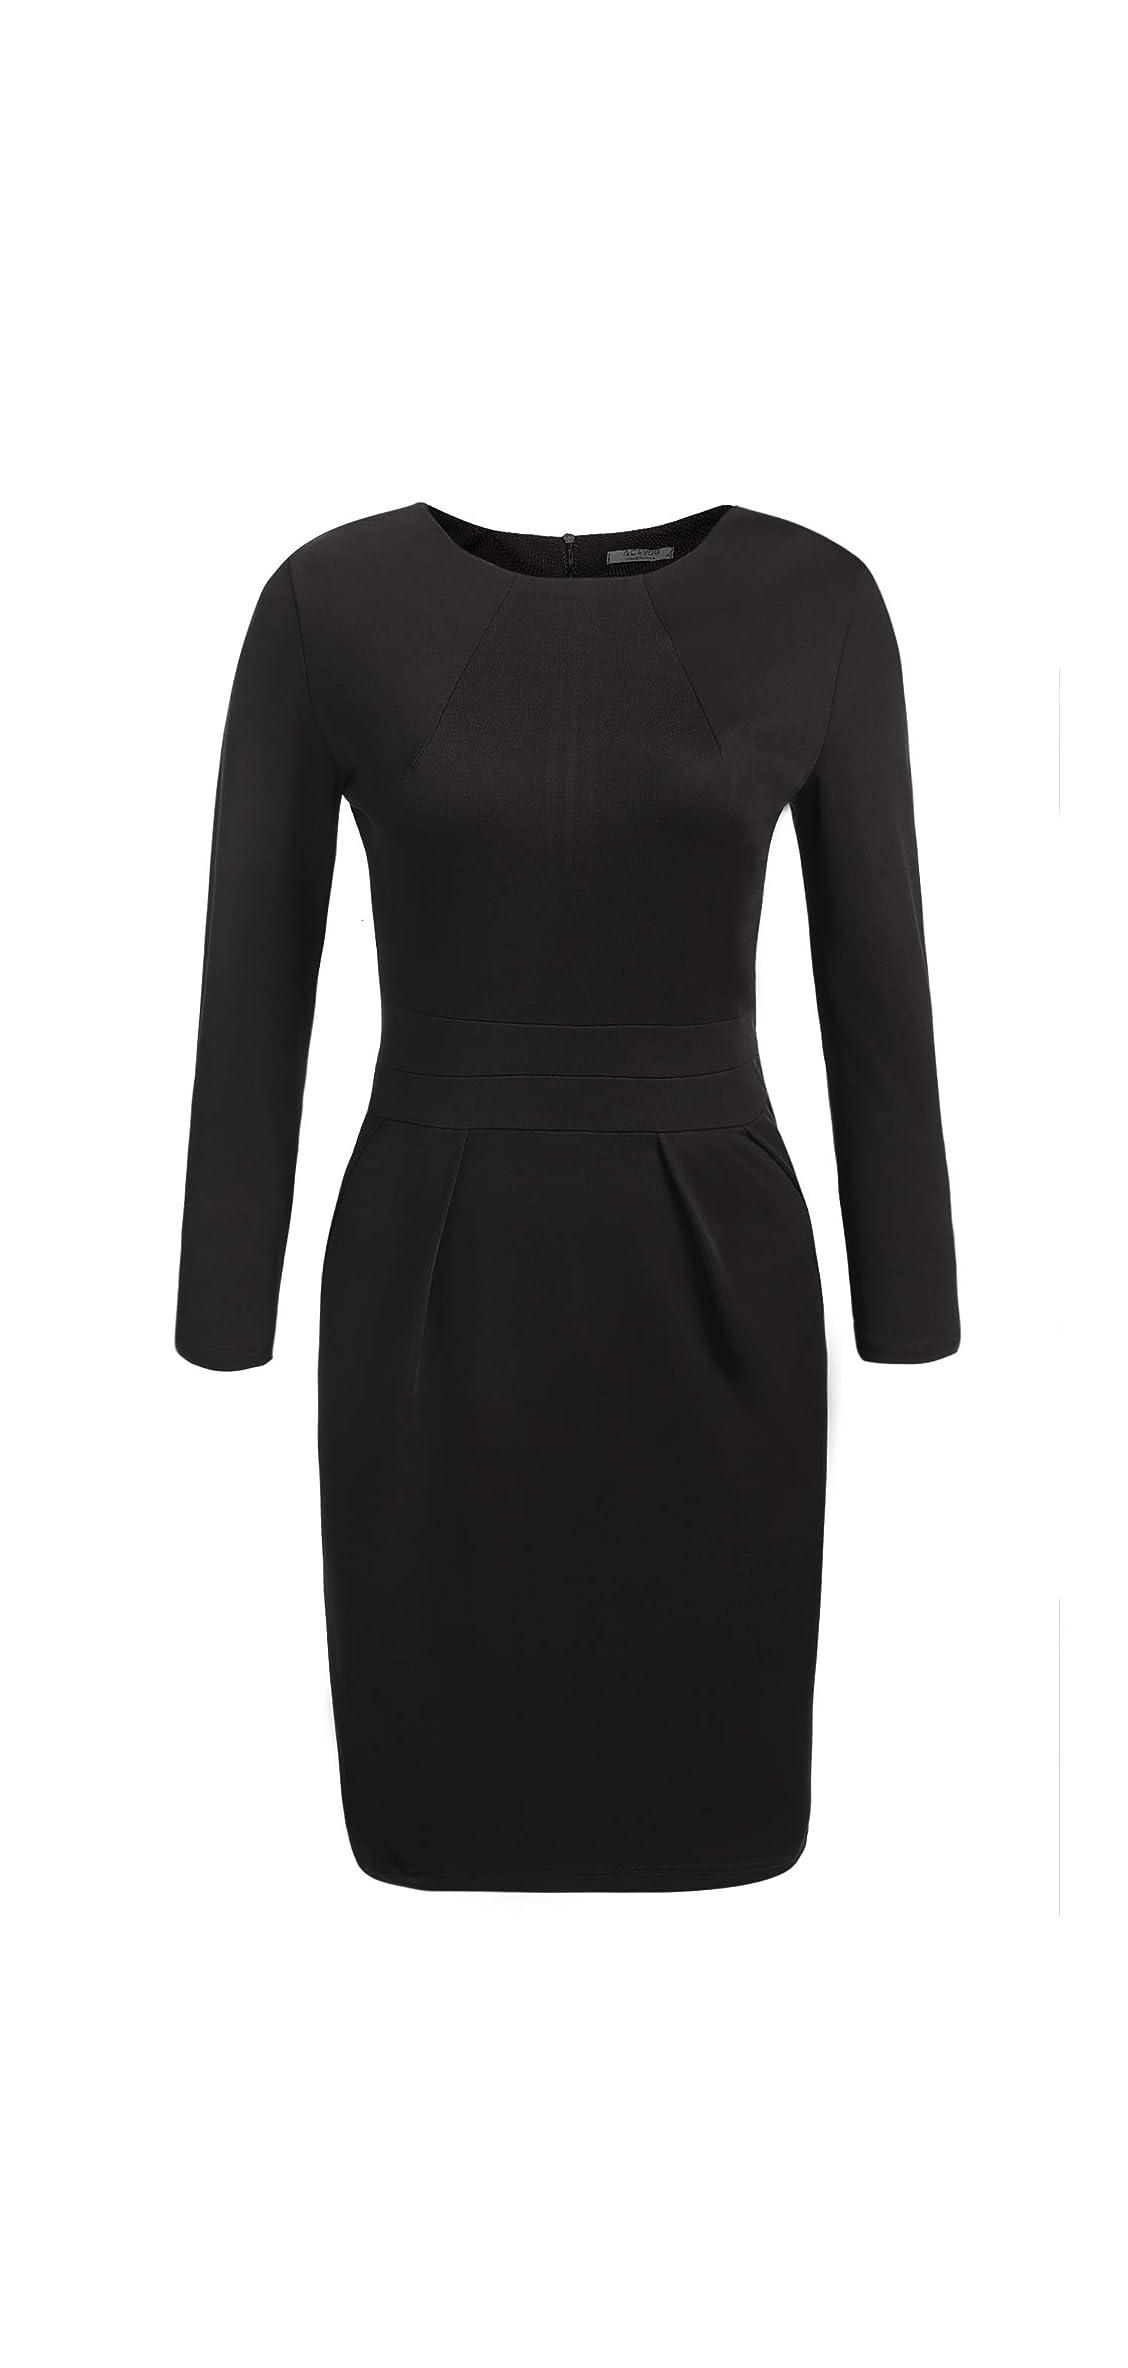 Women's Work Dress Official Wear To Work Retro Business